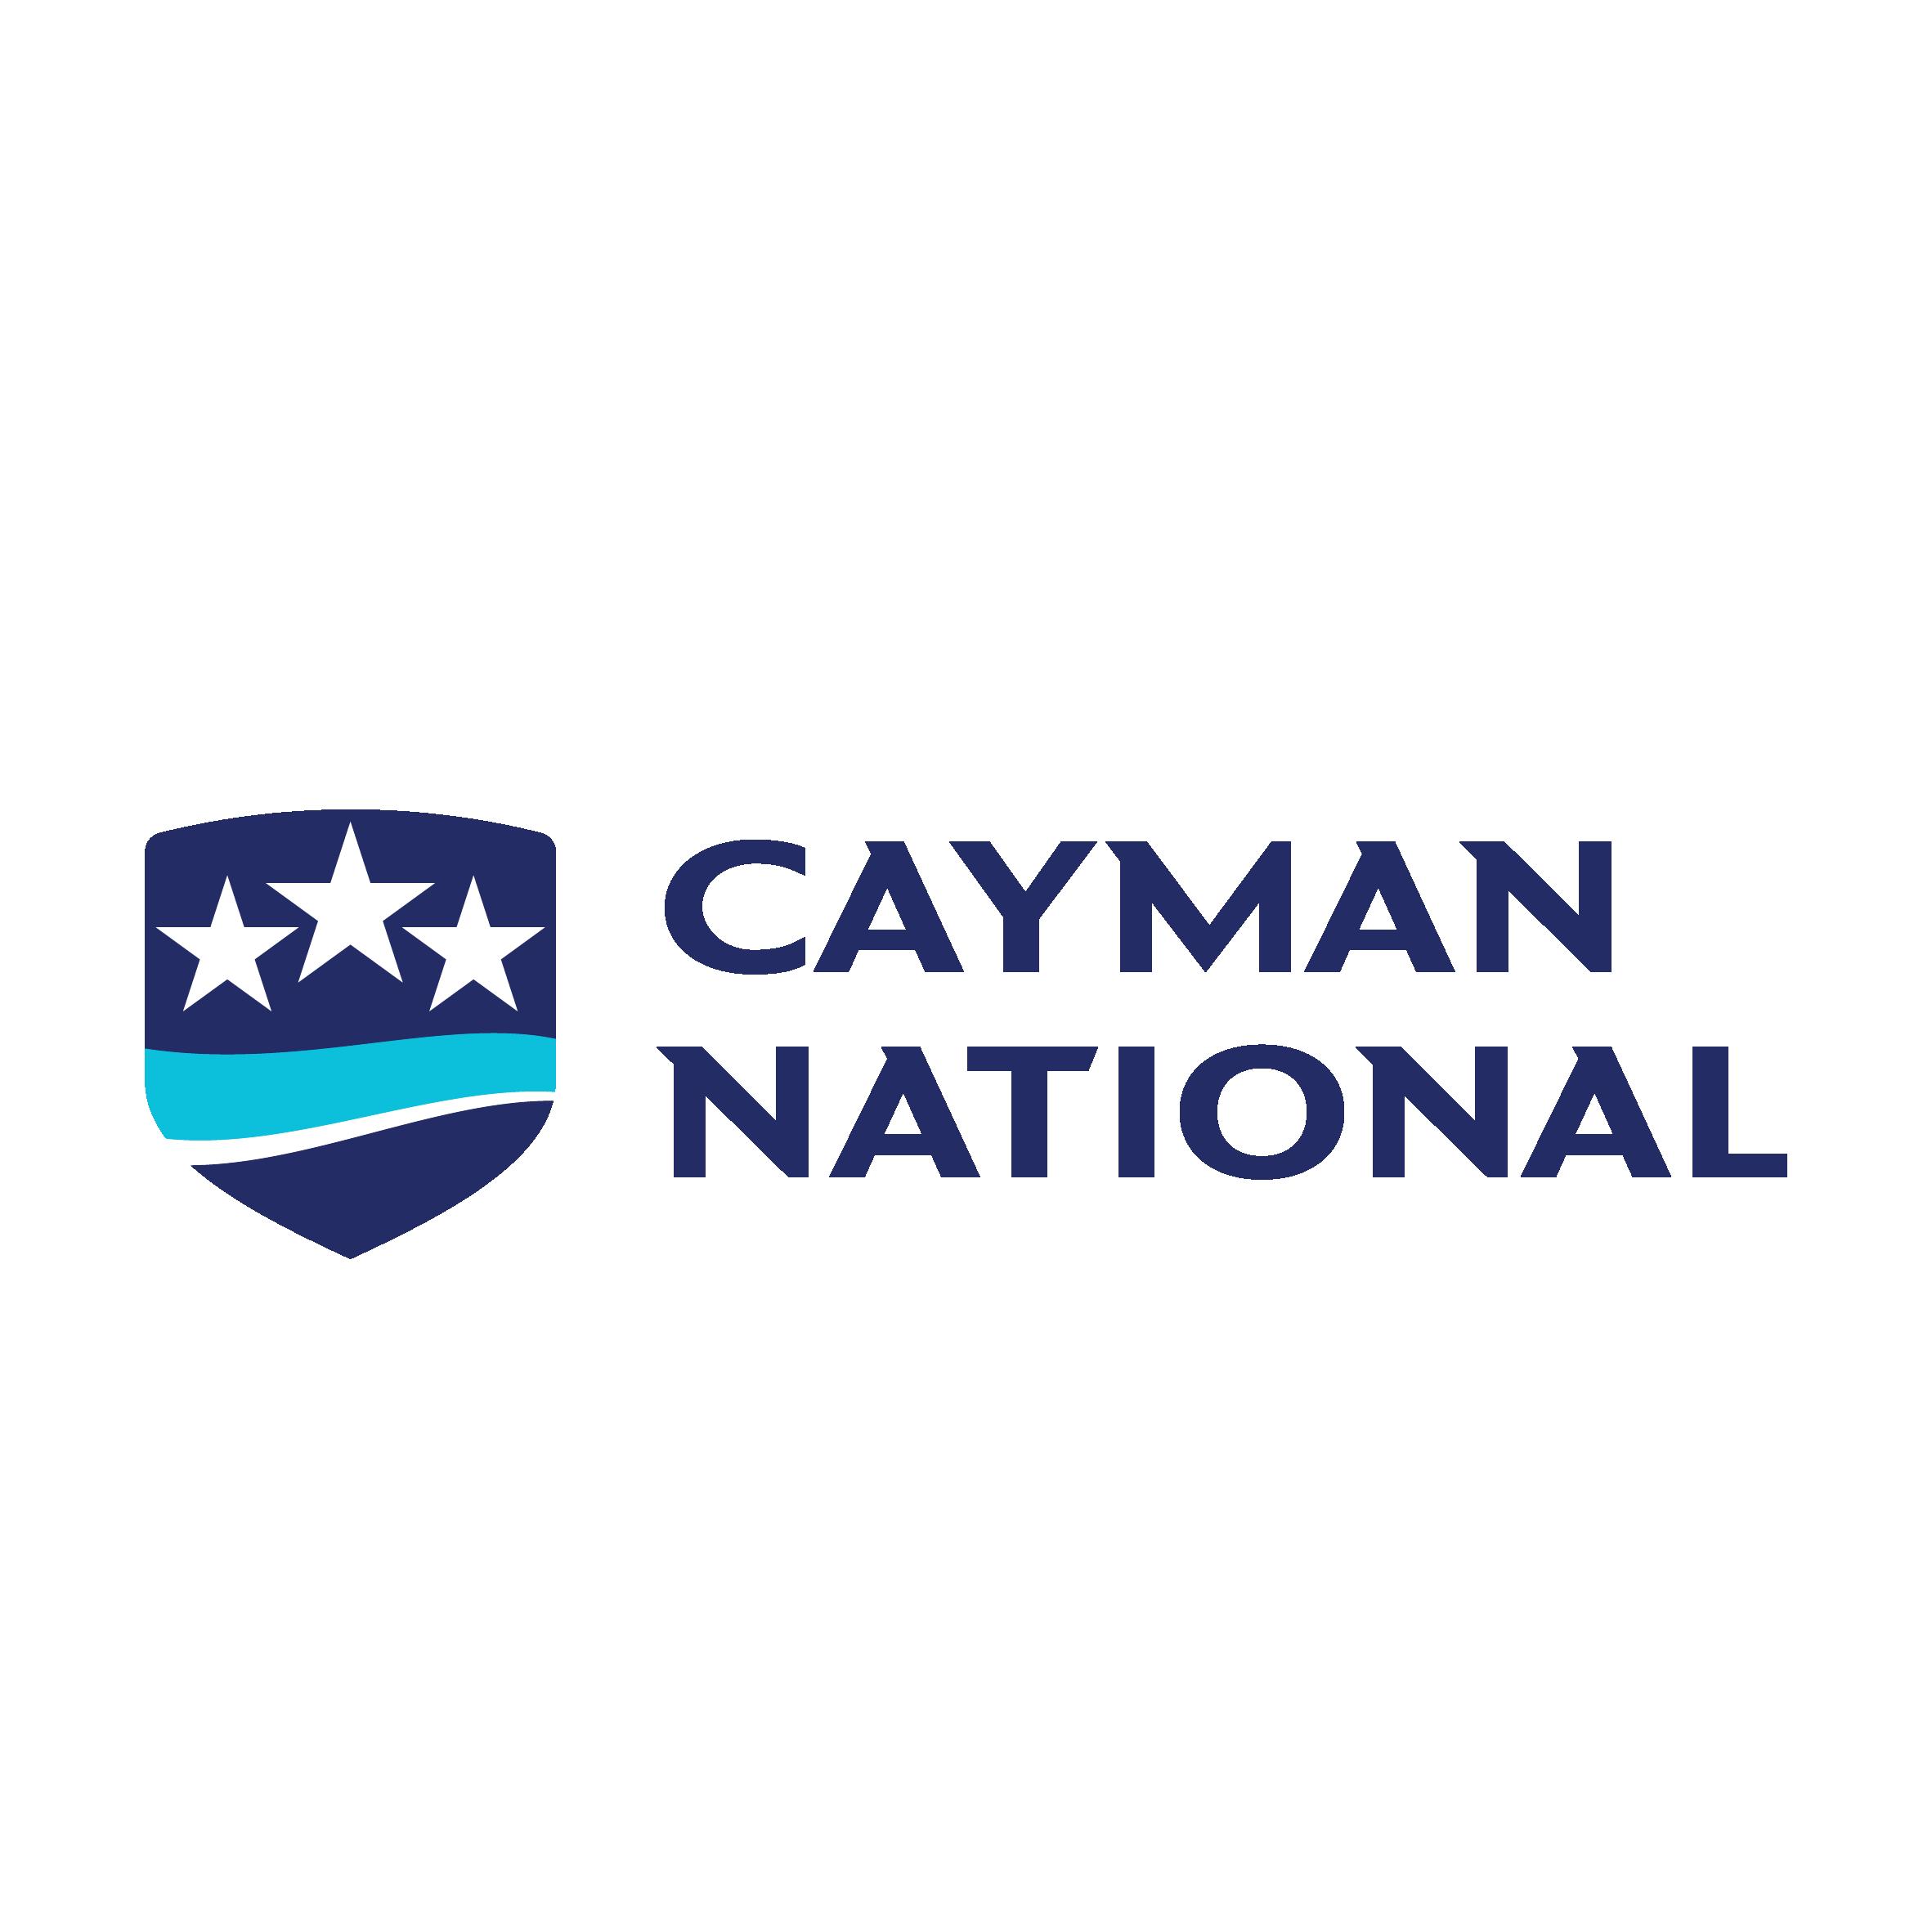 Cayman National Corporation logo.